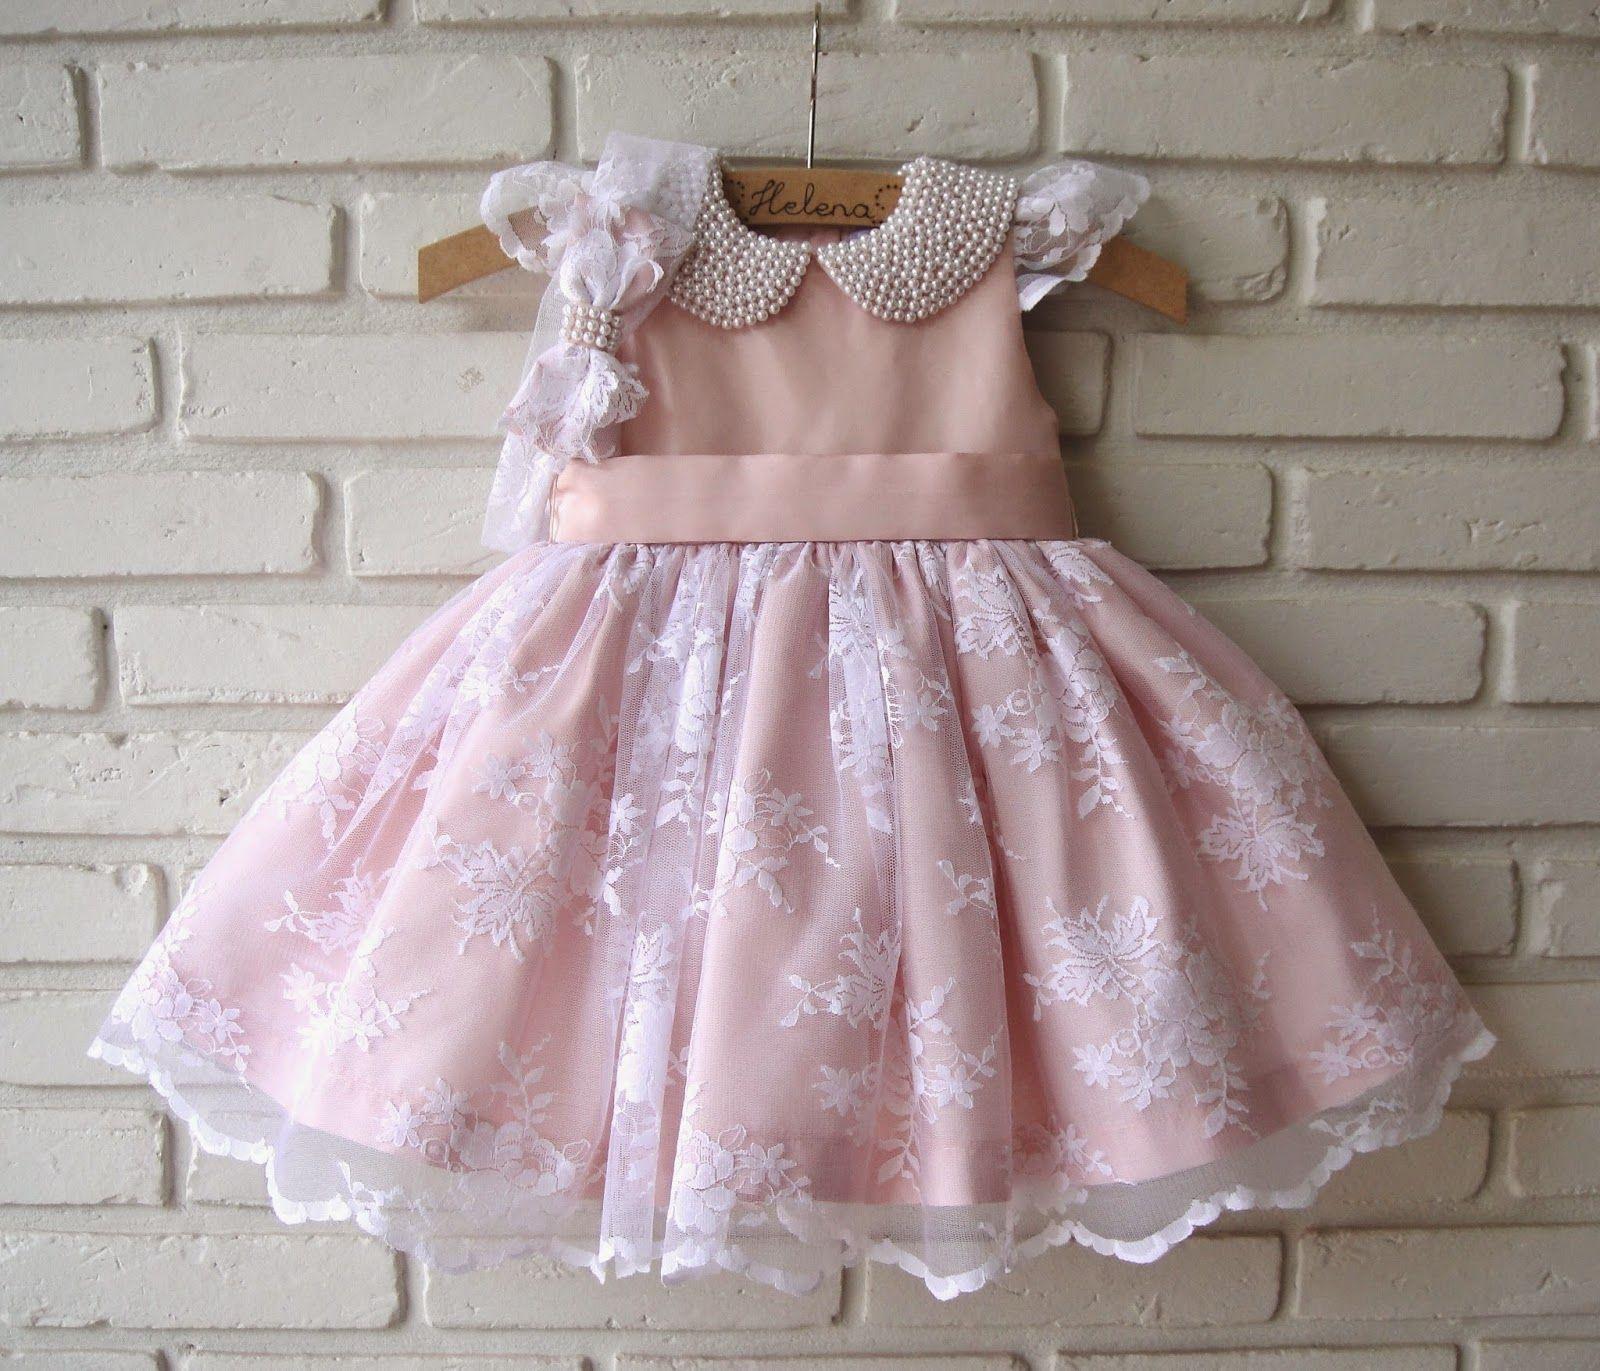 81395f21f8f vestido infantil festa 1 ano - Pesquisa Google | vestido Sarah ...